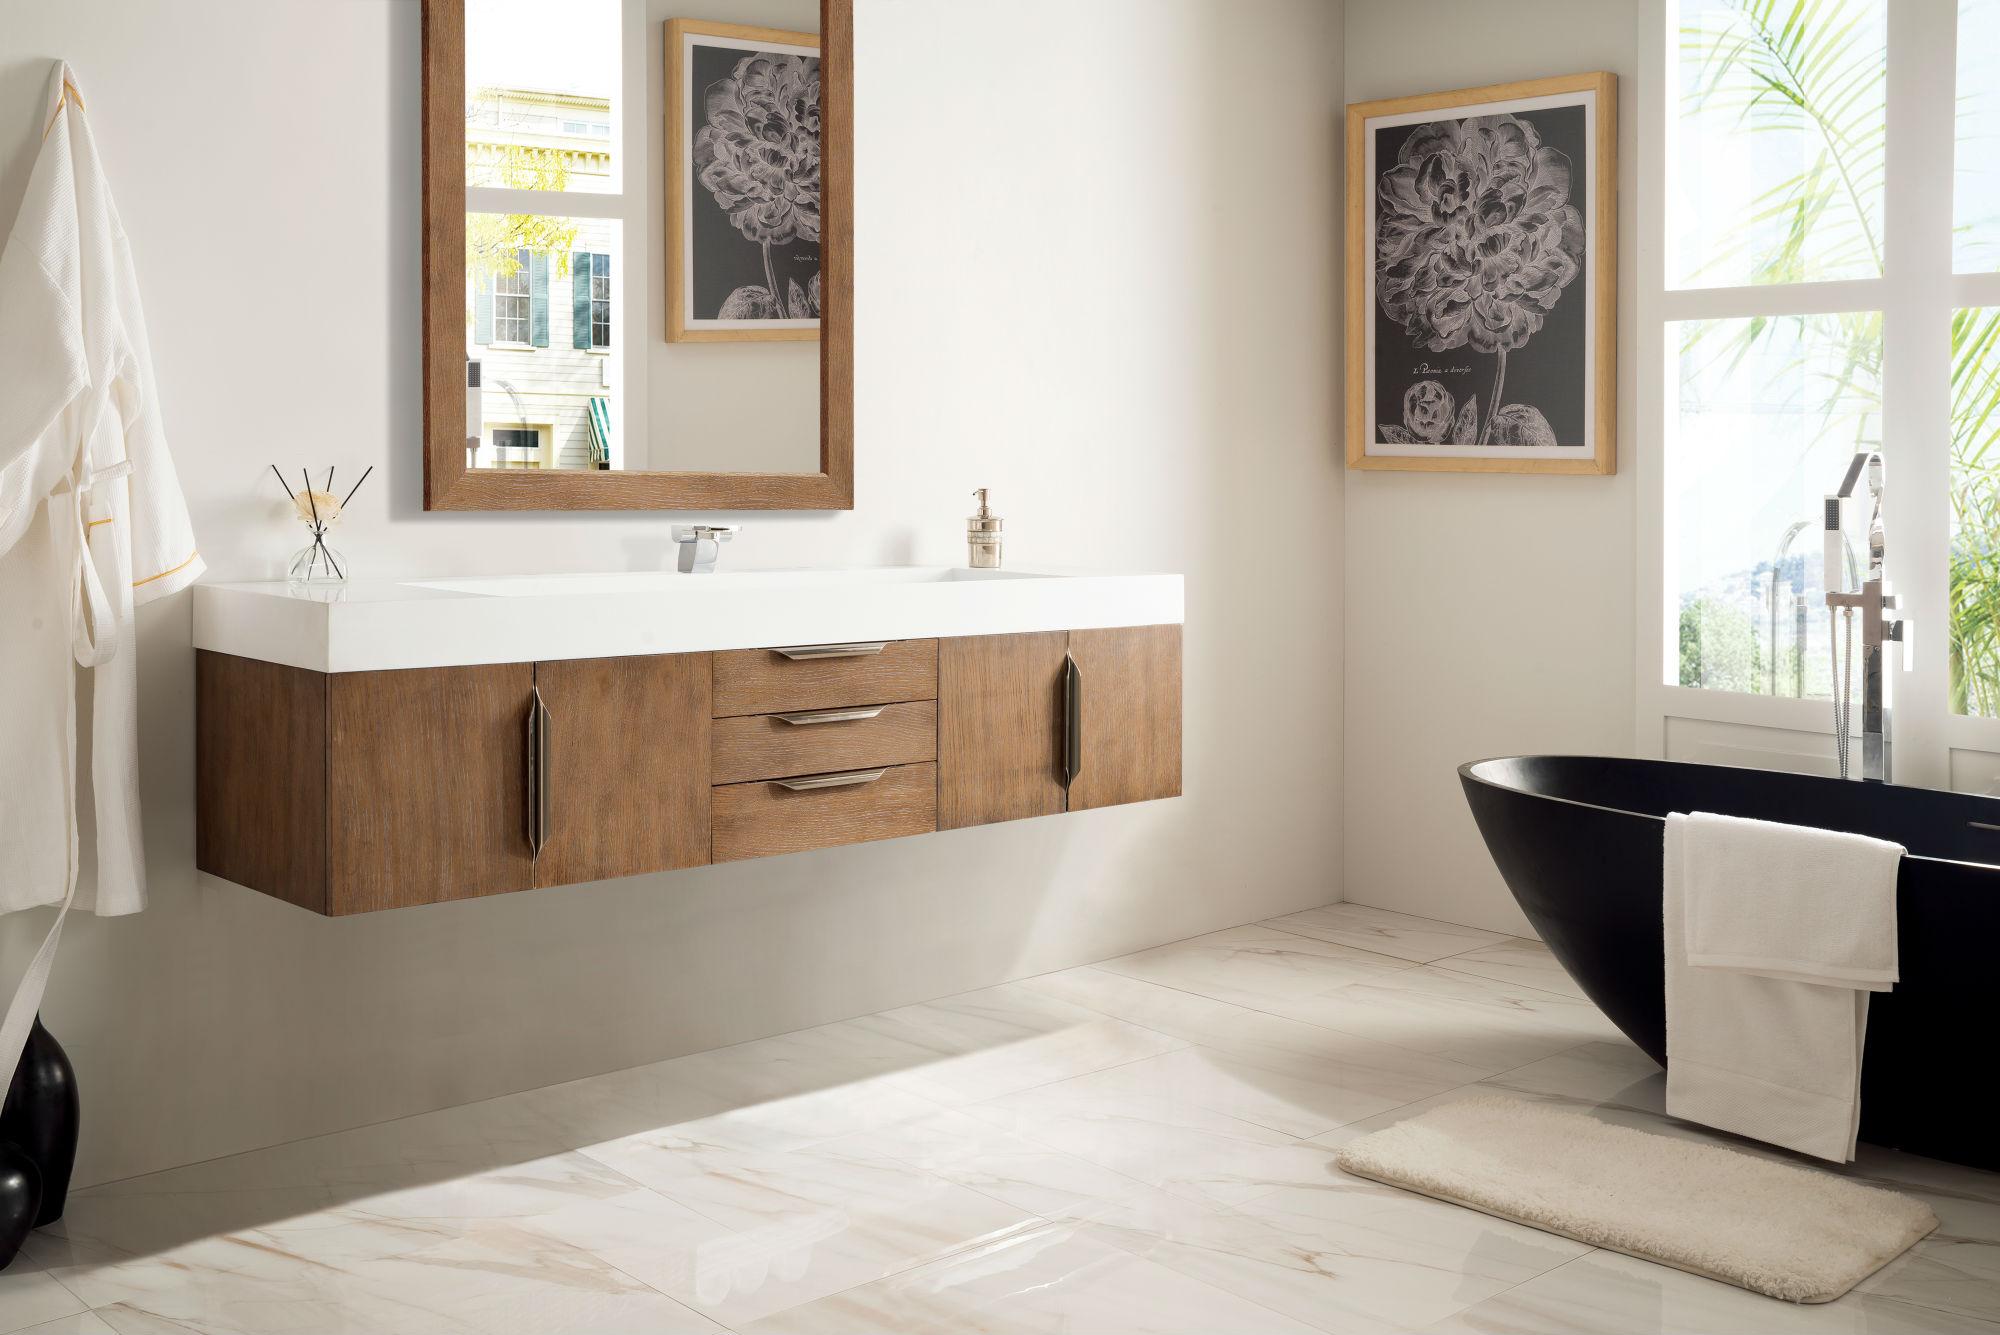 Mercer Island 72 Single Bathroom Vanity Latte Oak Brushed Gold Hardware Gloss White Sink Keetchen